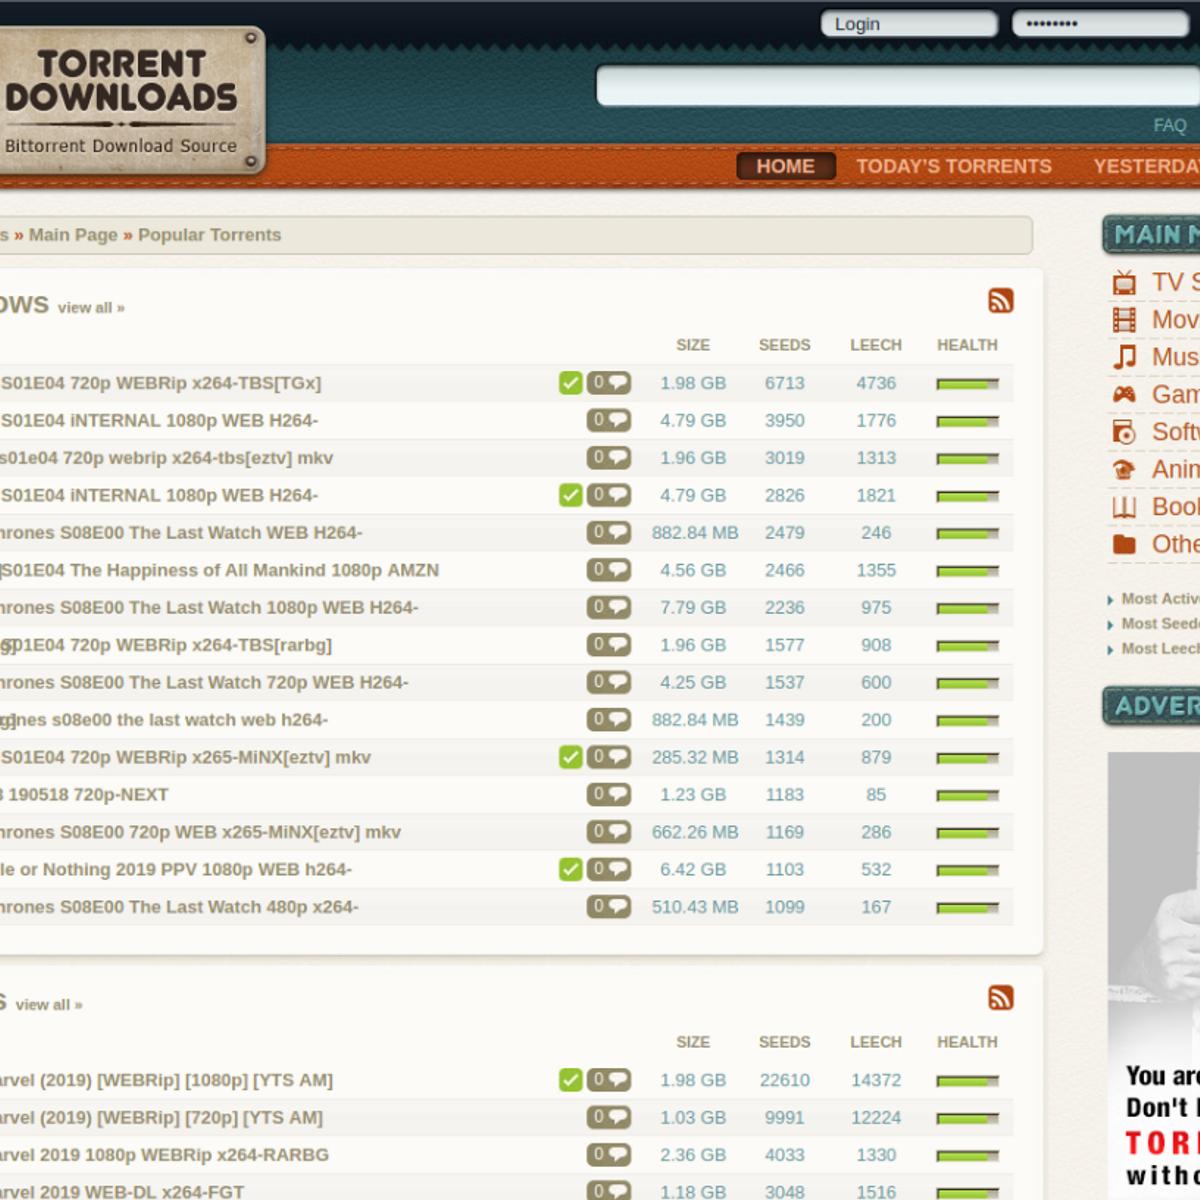 Torrent Downloads Alternatives and Similar Websites and Apps